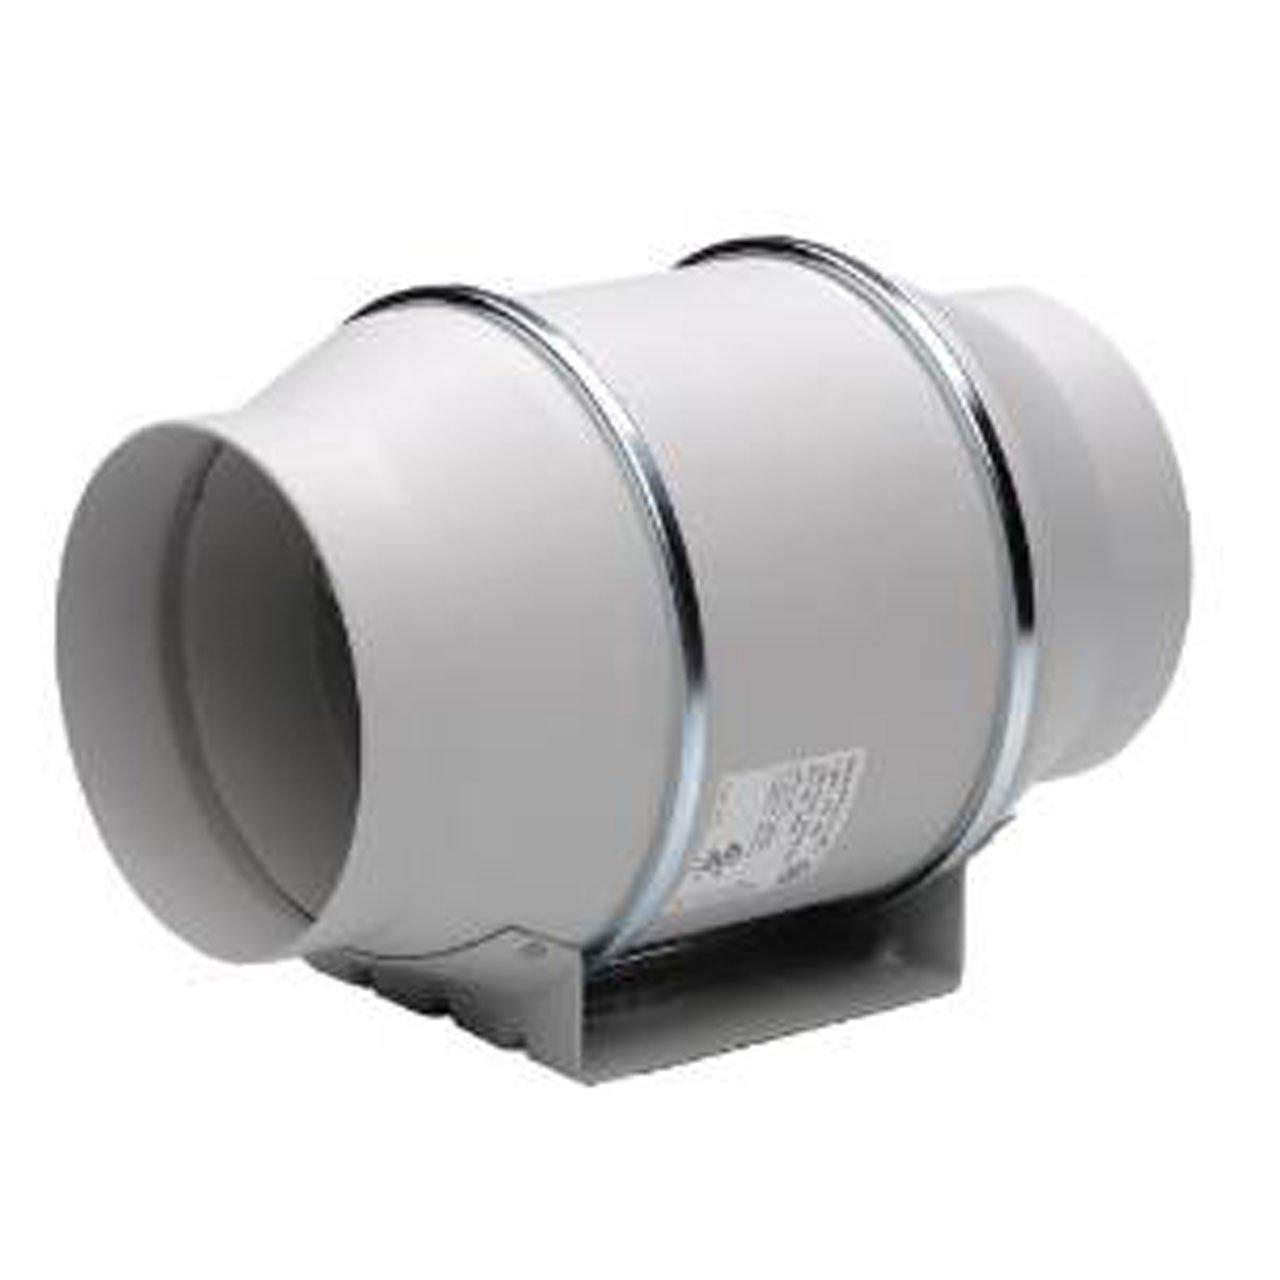 Amazon.com: Soler U0026 Palau TD 100X In Line Exhaust Fan: Home Improvement